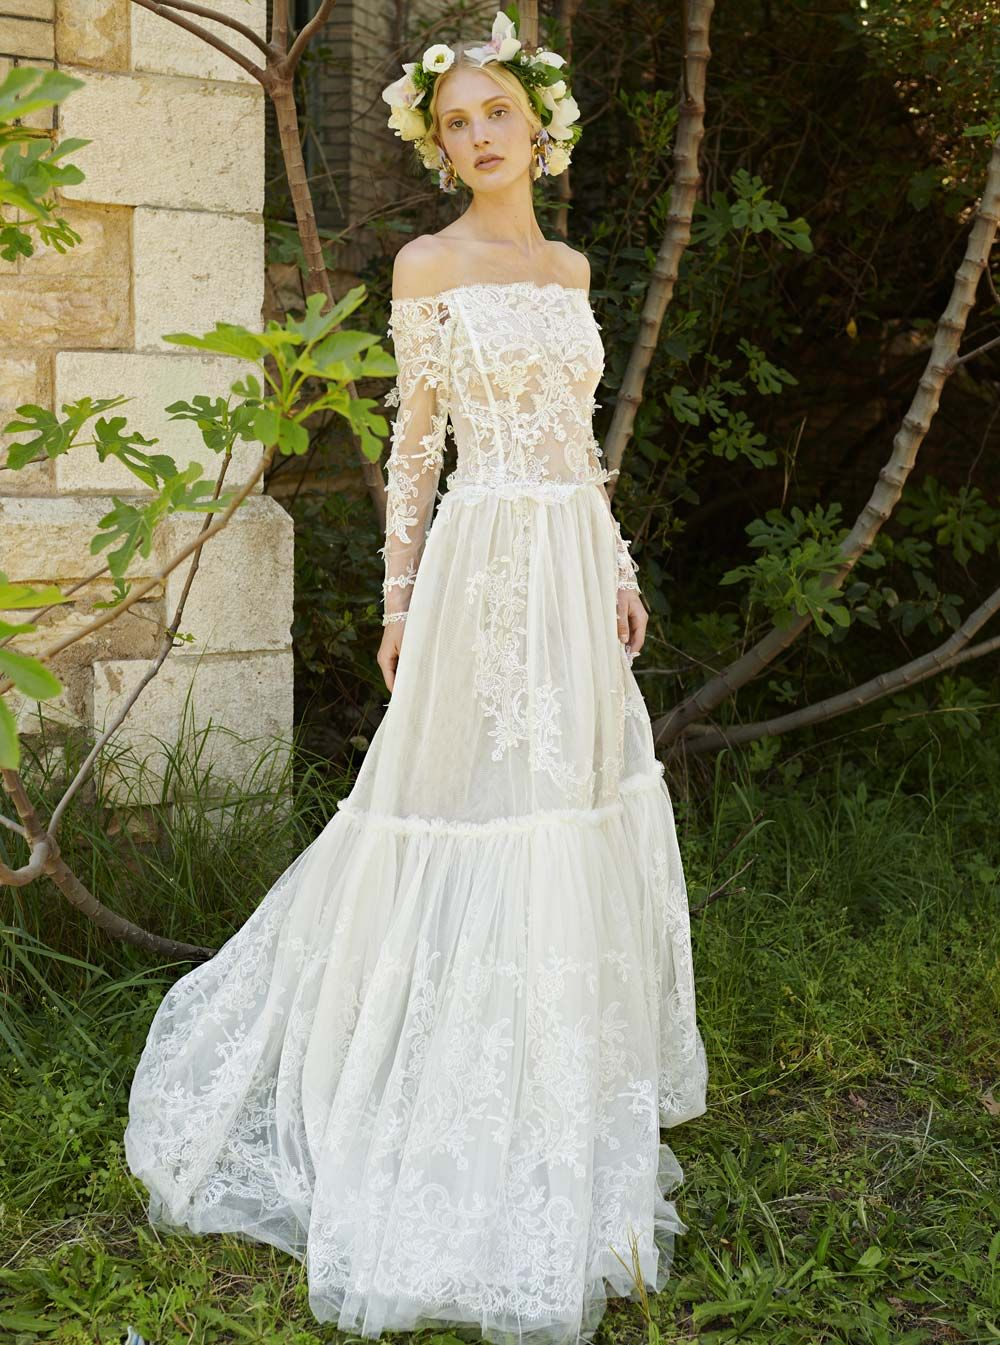 5 Boho Chic Beach Wedding Dress Designers Hawaii Wedding Gown Gallery It Bridesmaid Dresses Boho Beach Wedding Dress Designers Off Shoulder Wedding Dress